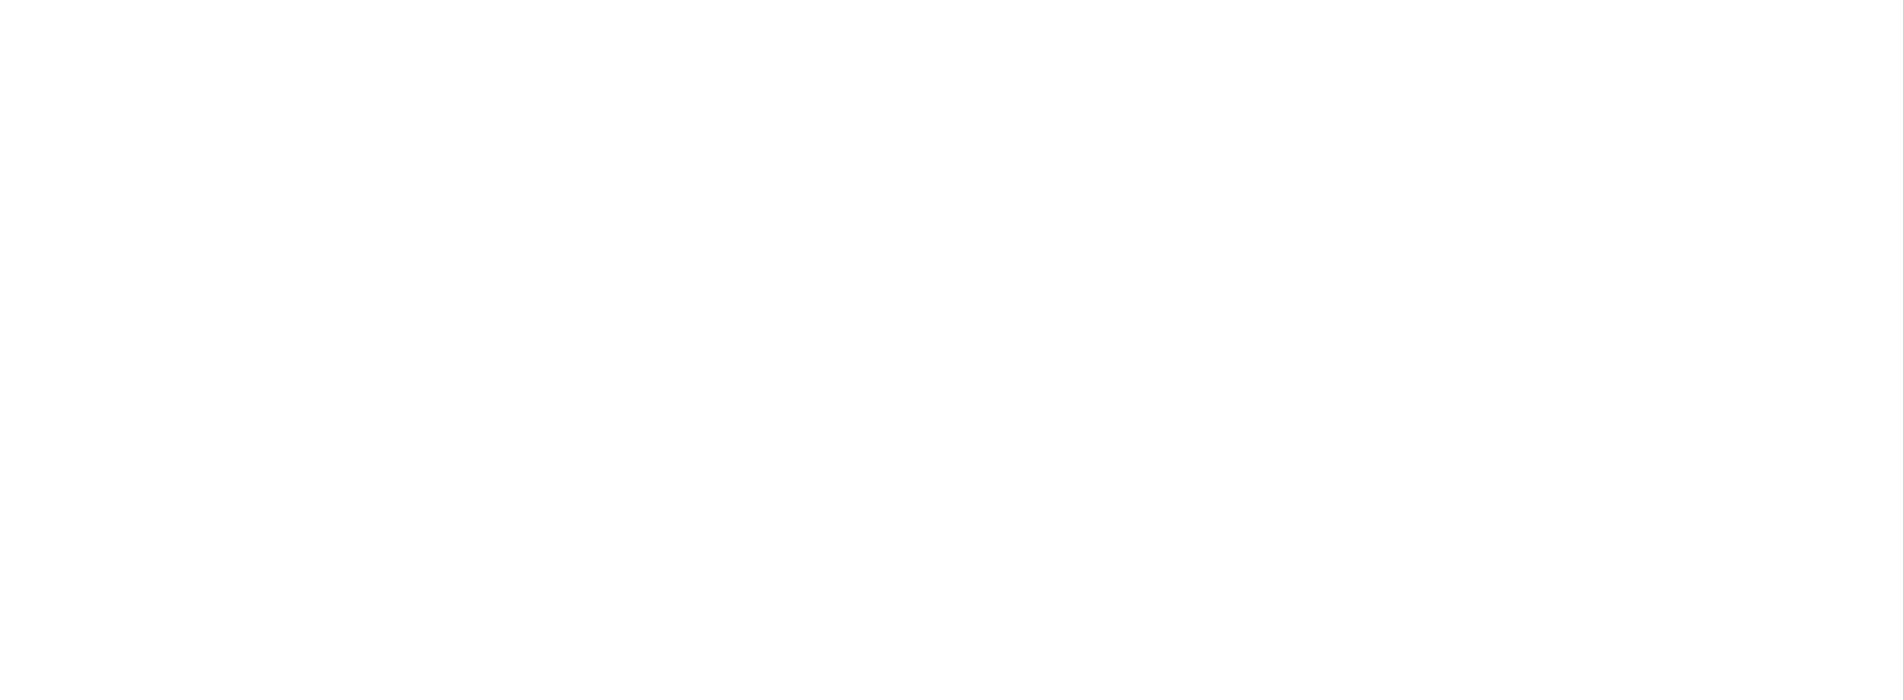 trans-bk